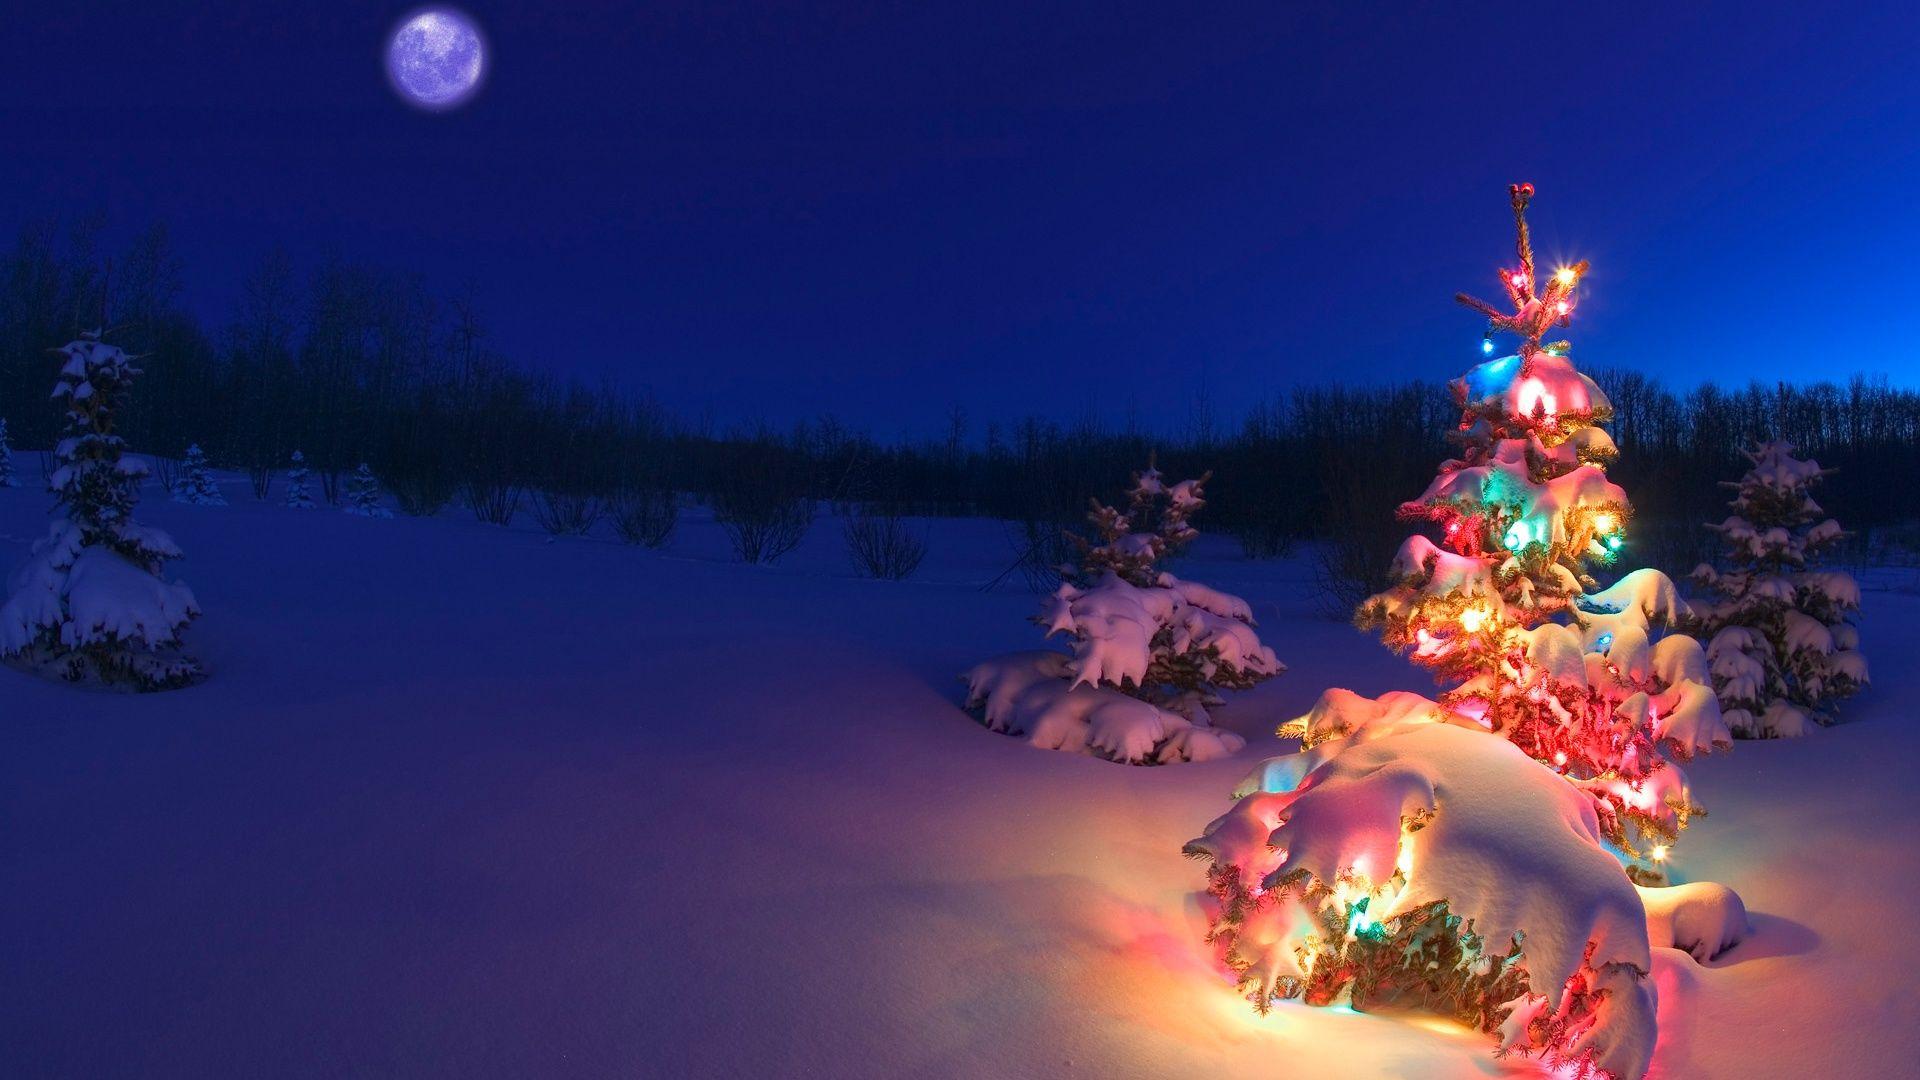 Christmas Desktop Pictures.Christmas Desktop Wallpaper Desktop And Mobile Wallpapers